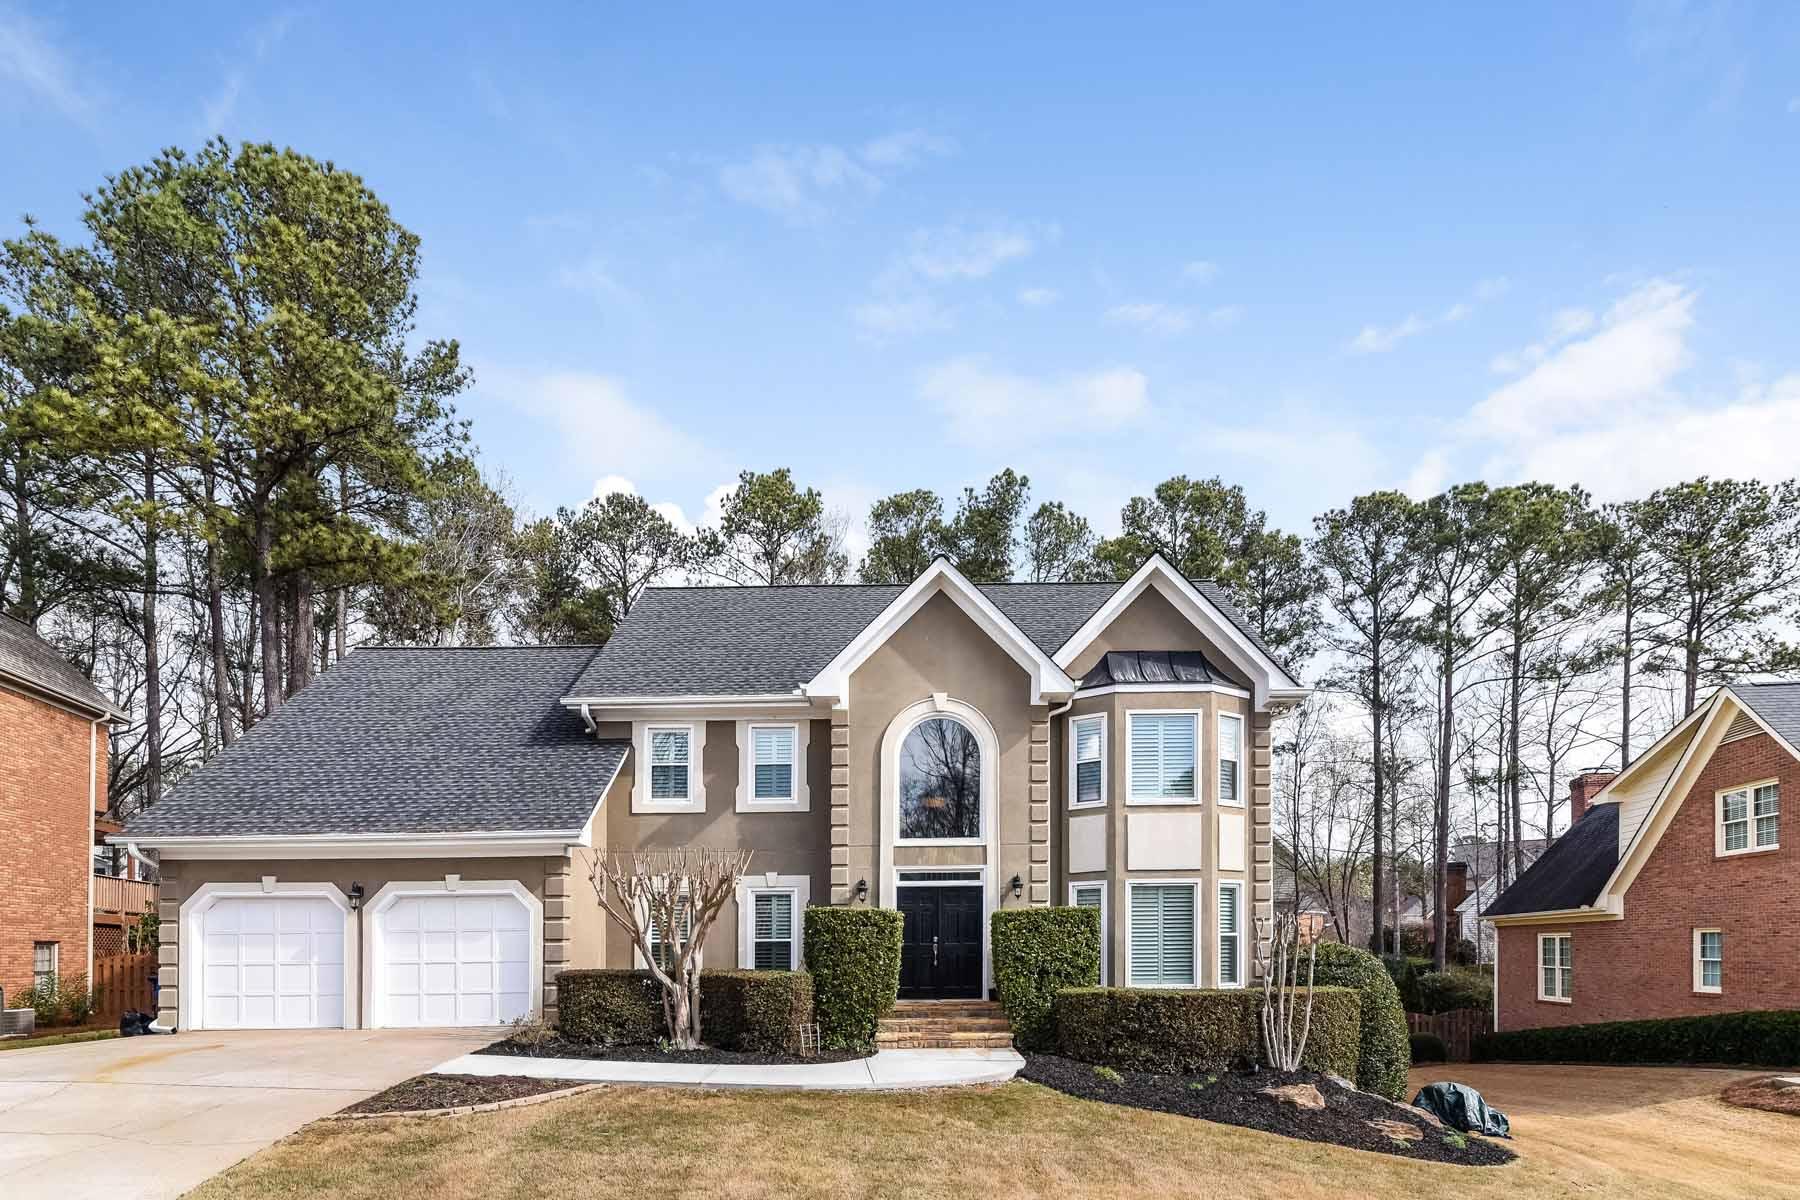 Nhà ở một gia đình vì Bán tại Wonderful Home With Outdoor Oasis Includes Heated Pool and Spa 10465 Tuxford Dr Alpharetta, Georgia, 30022 Hoa Kỳ